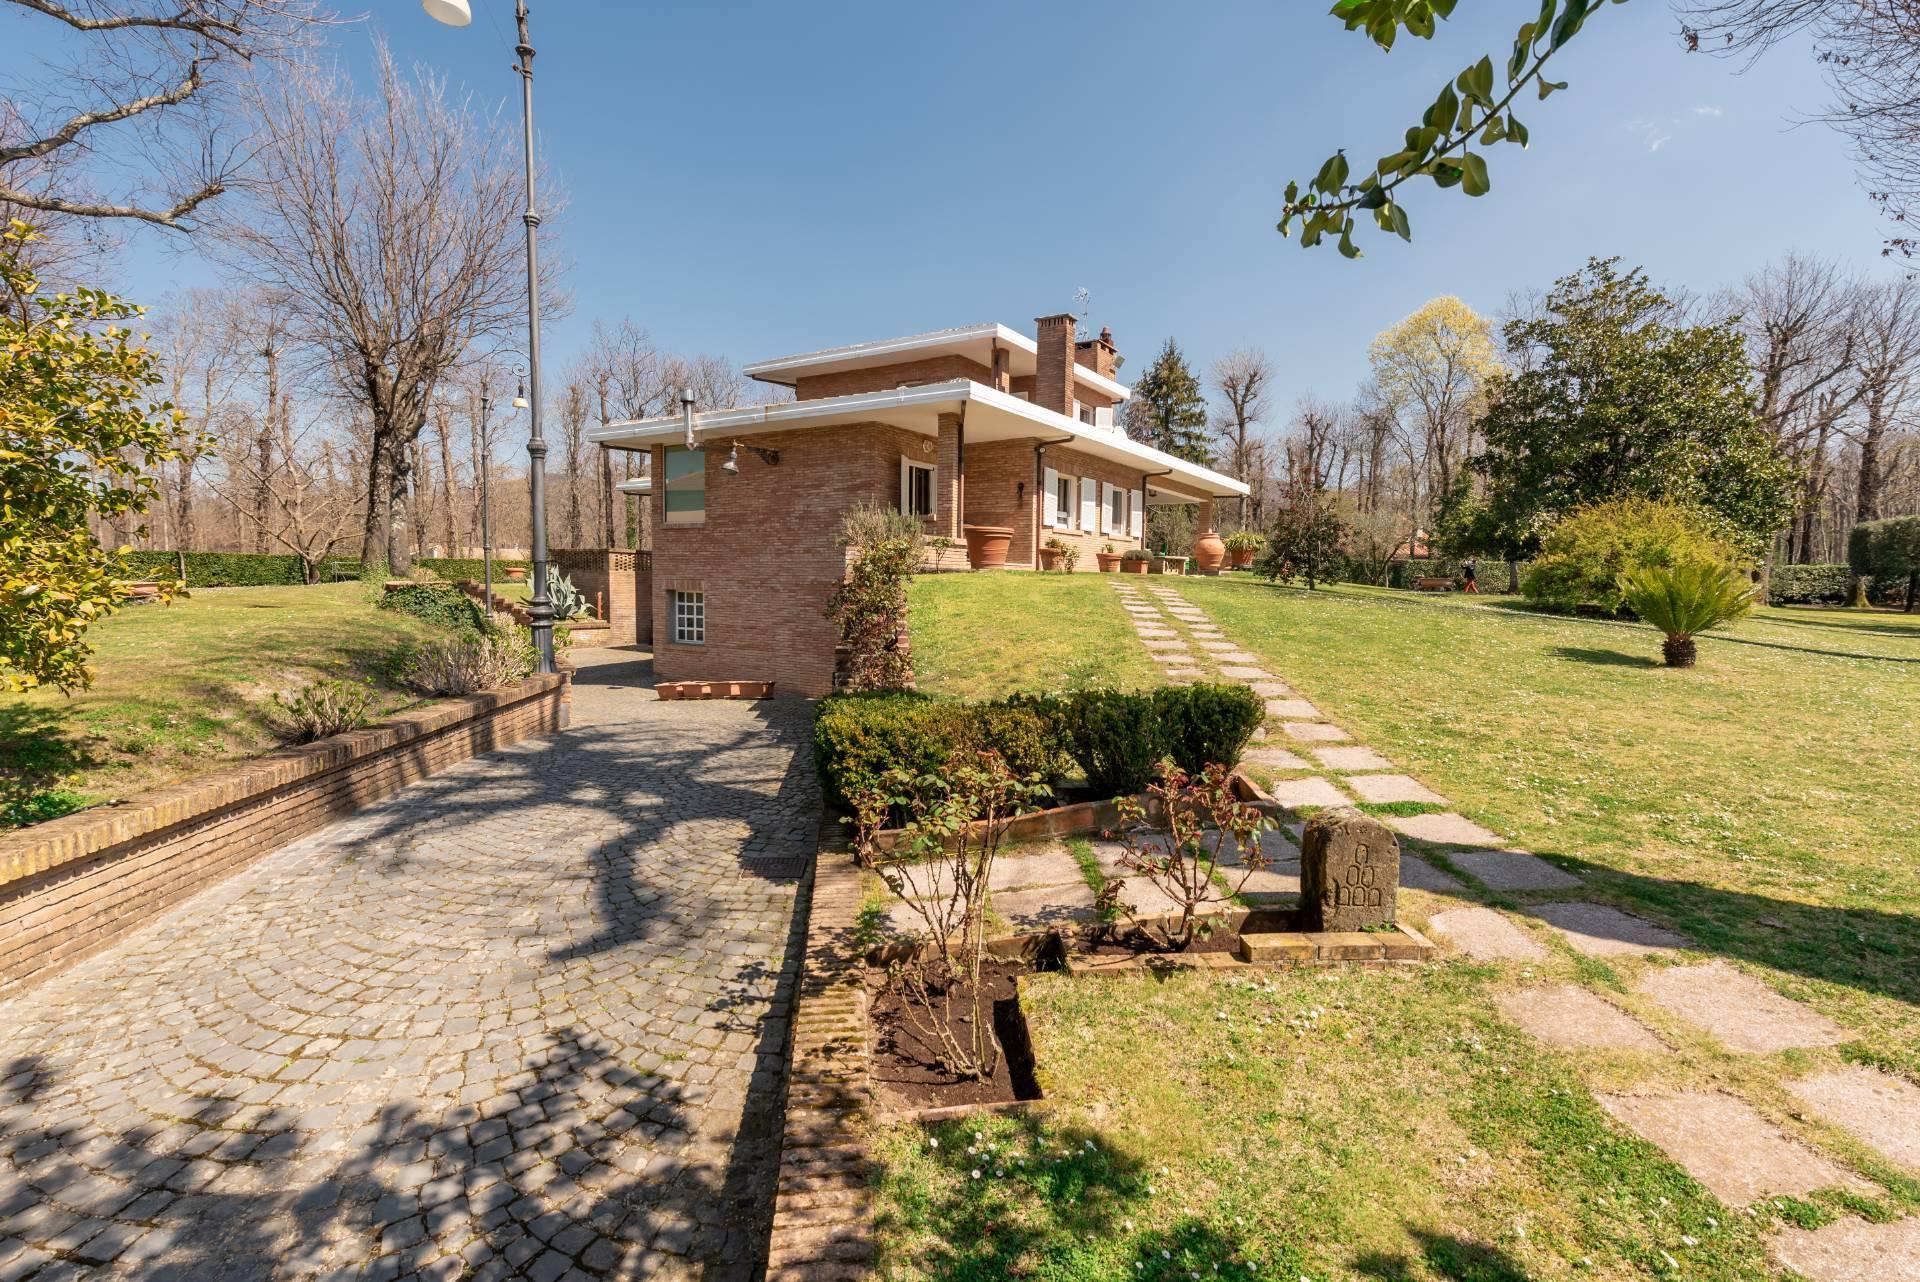 Villa in Vendita a Ariccia: 5 locali, 583 mq - Foto 2